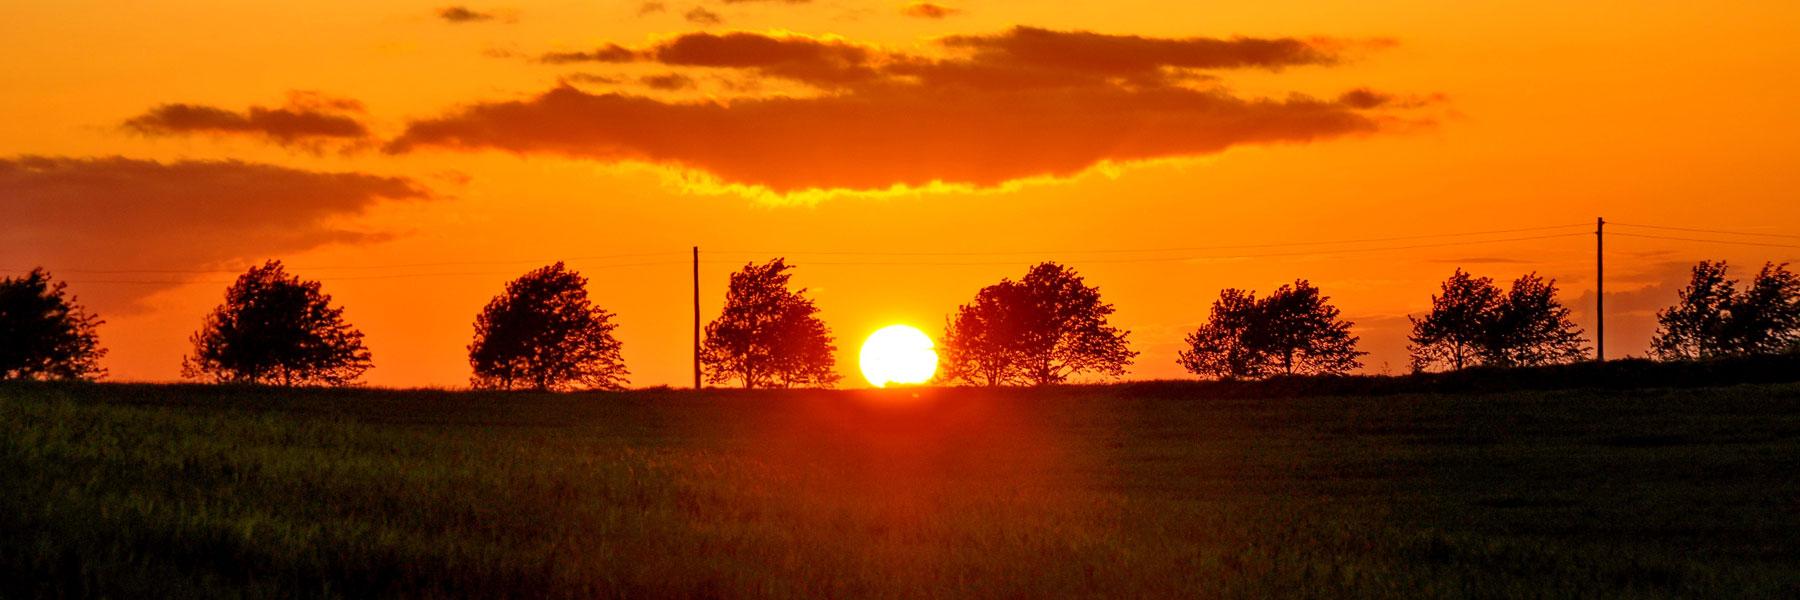 Sonnenuntergang - Krüger Naturcamping